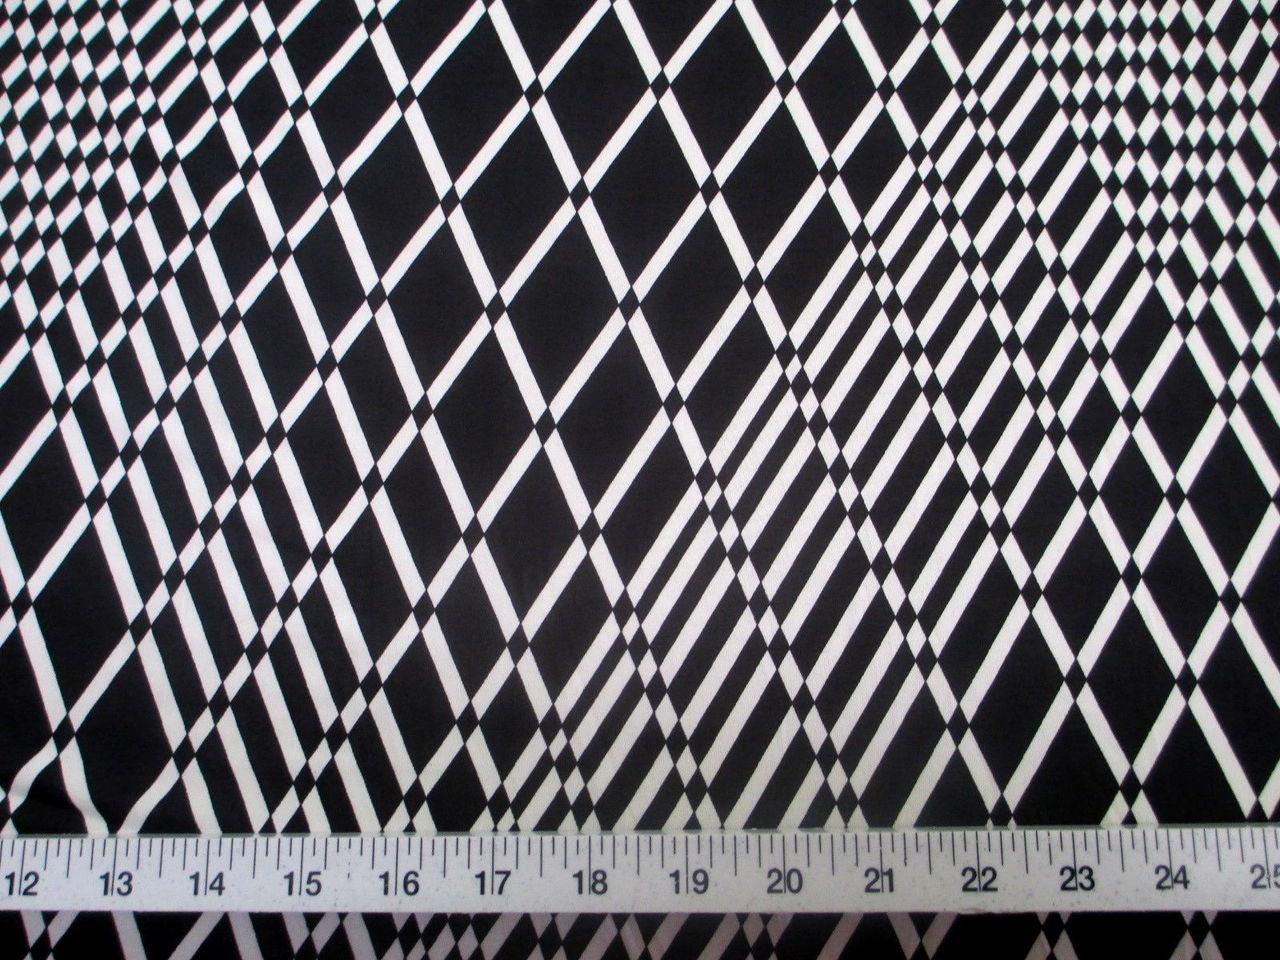 Discount Fabric Printed Lycra Spandex Stretch Black White Geometric Diamond B201